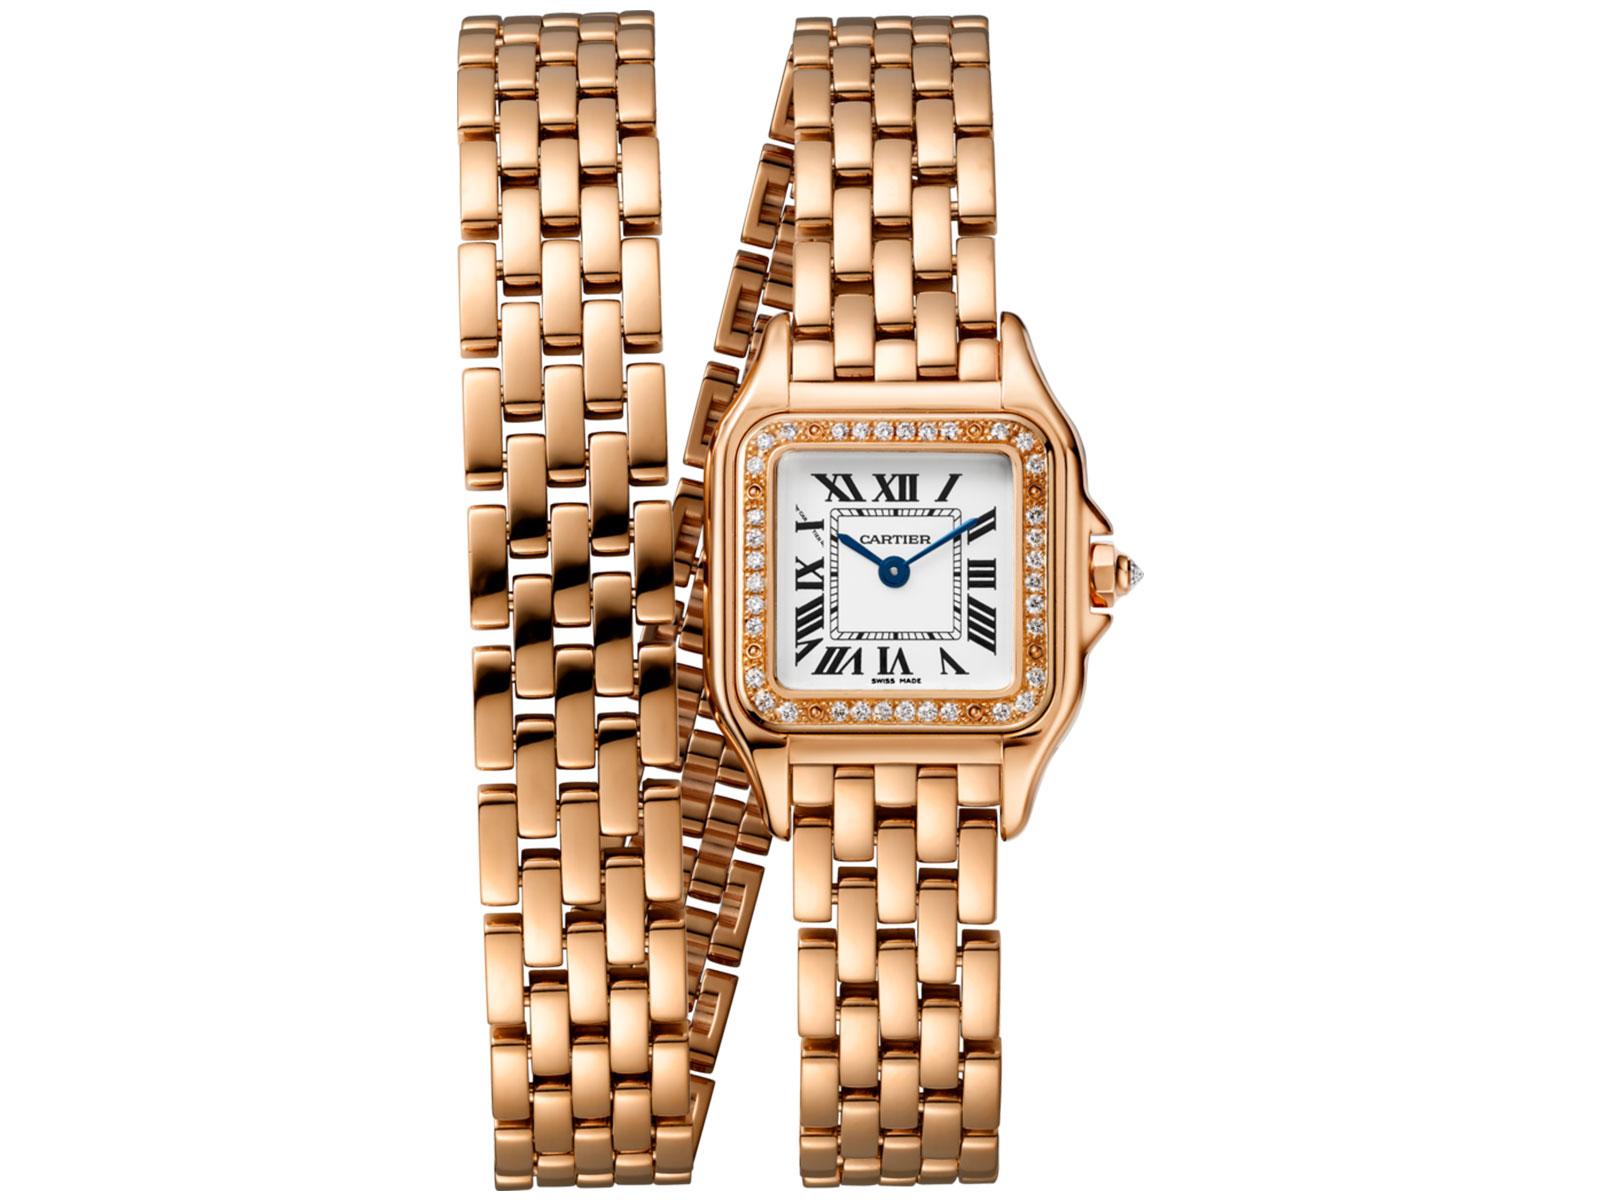 Panthere-de-Cartier-Watch-Collection-2-2.jpg